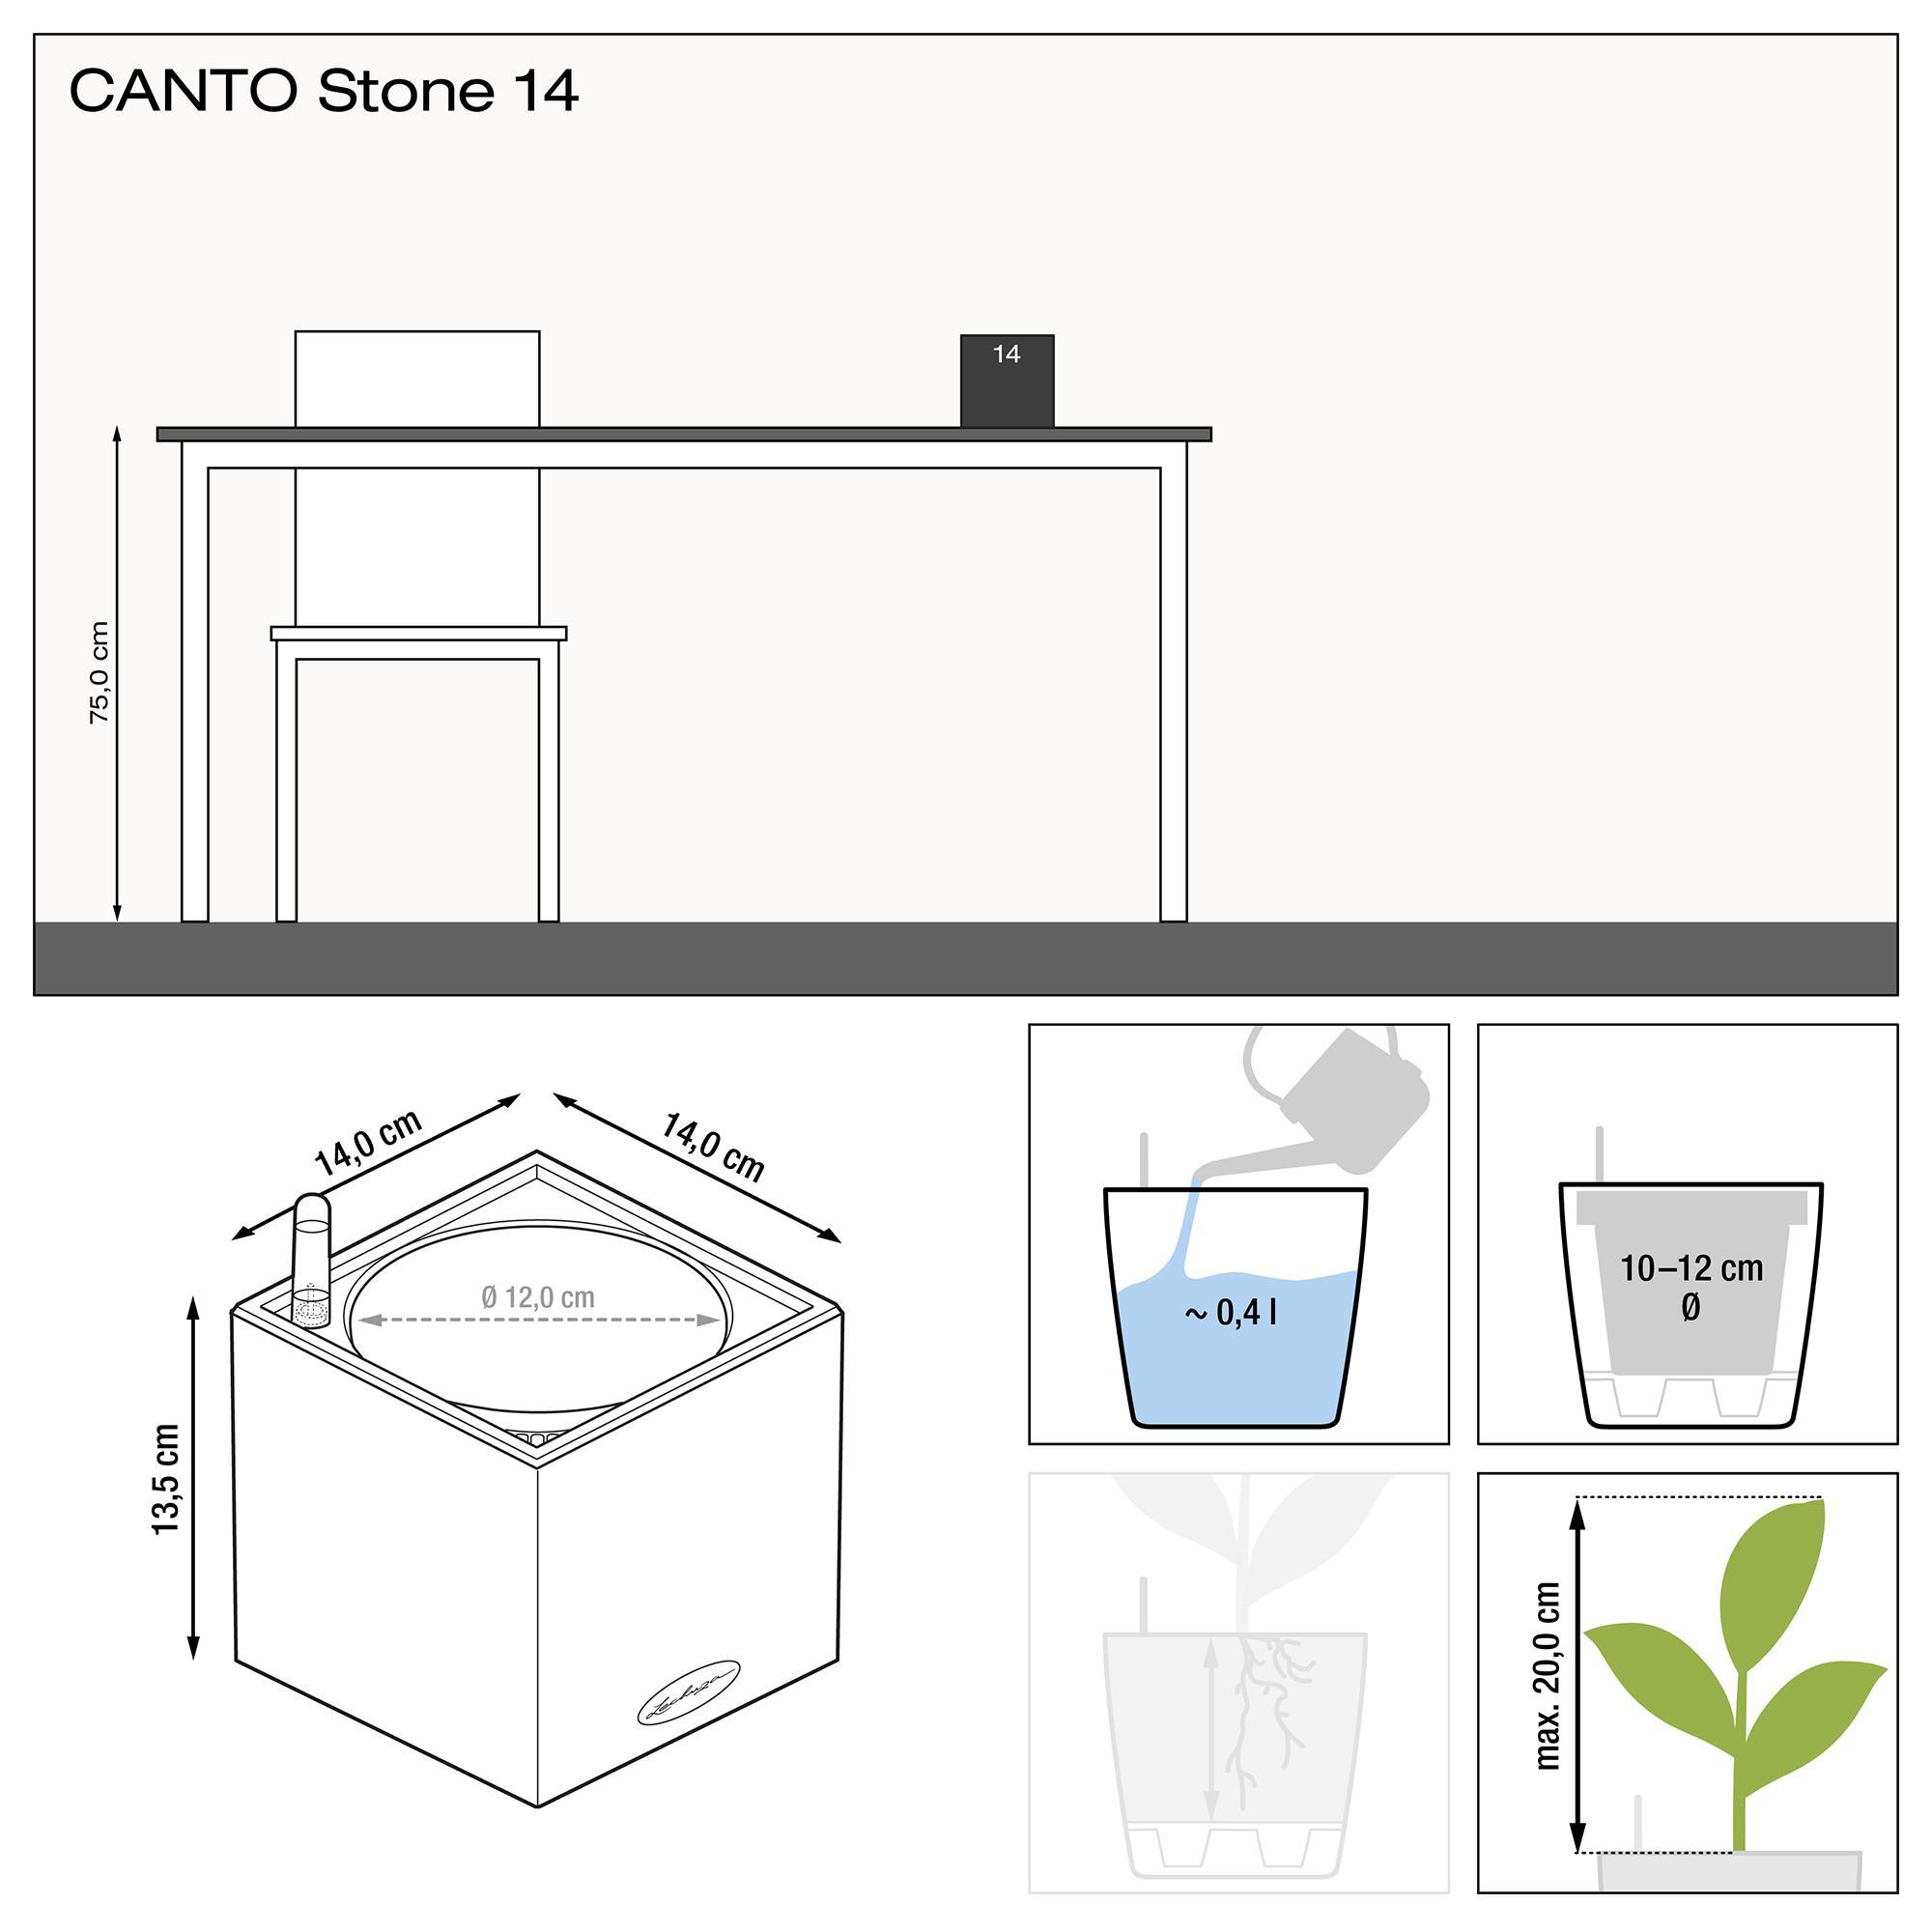 le_canto-stone-14_product_addi_nz